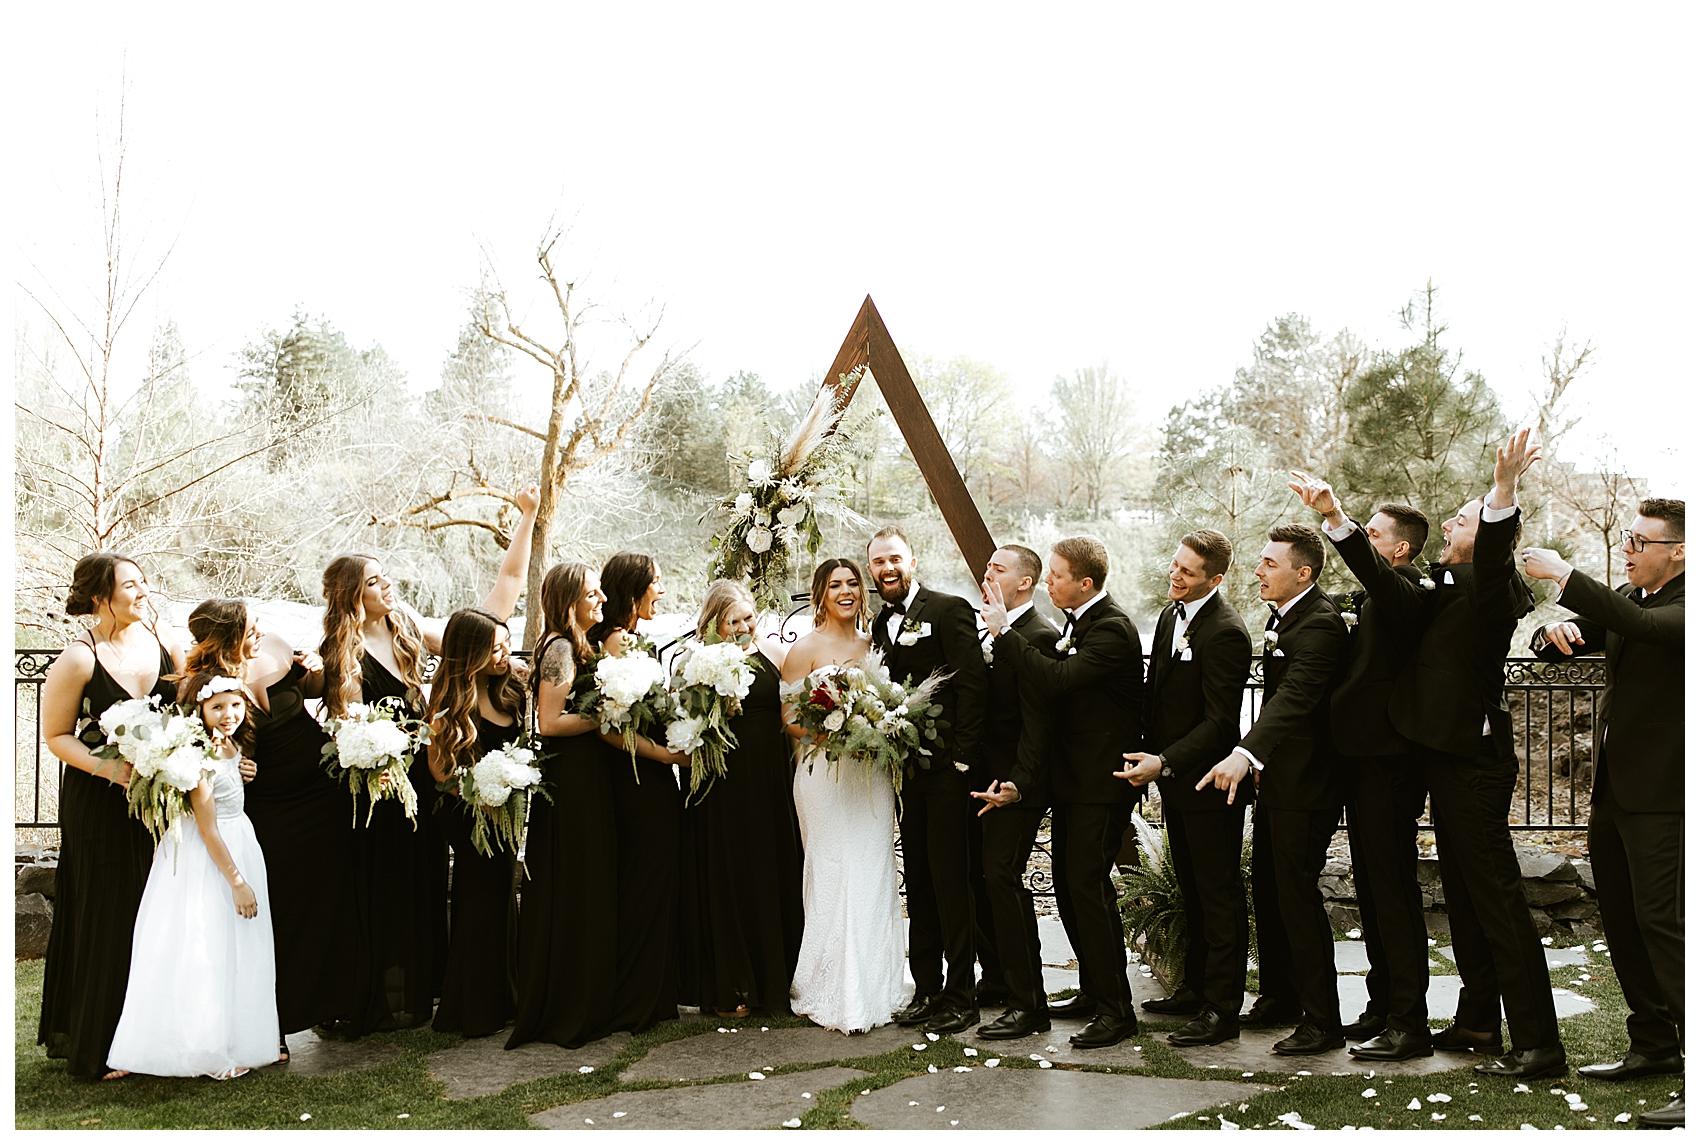 Chateau Rive Spokane Wedding Cassie Trottier Photography01064.jpg